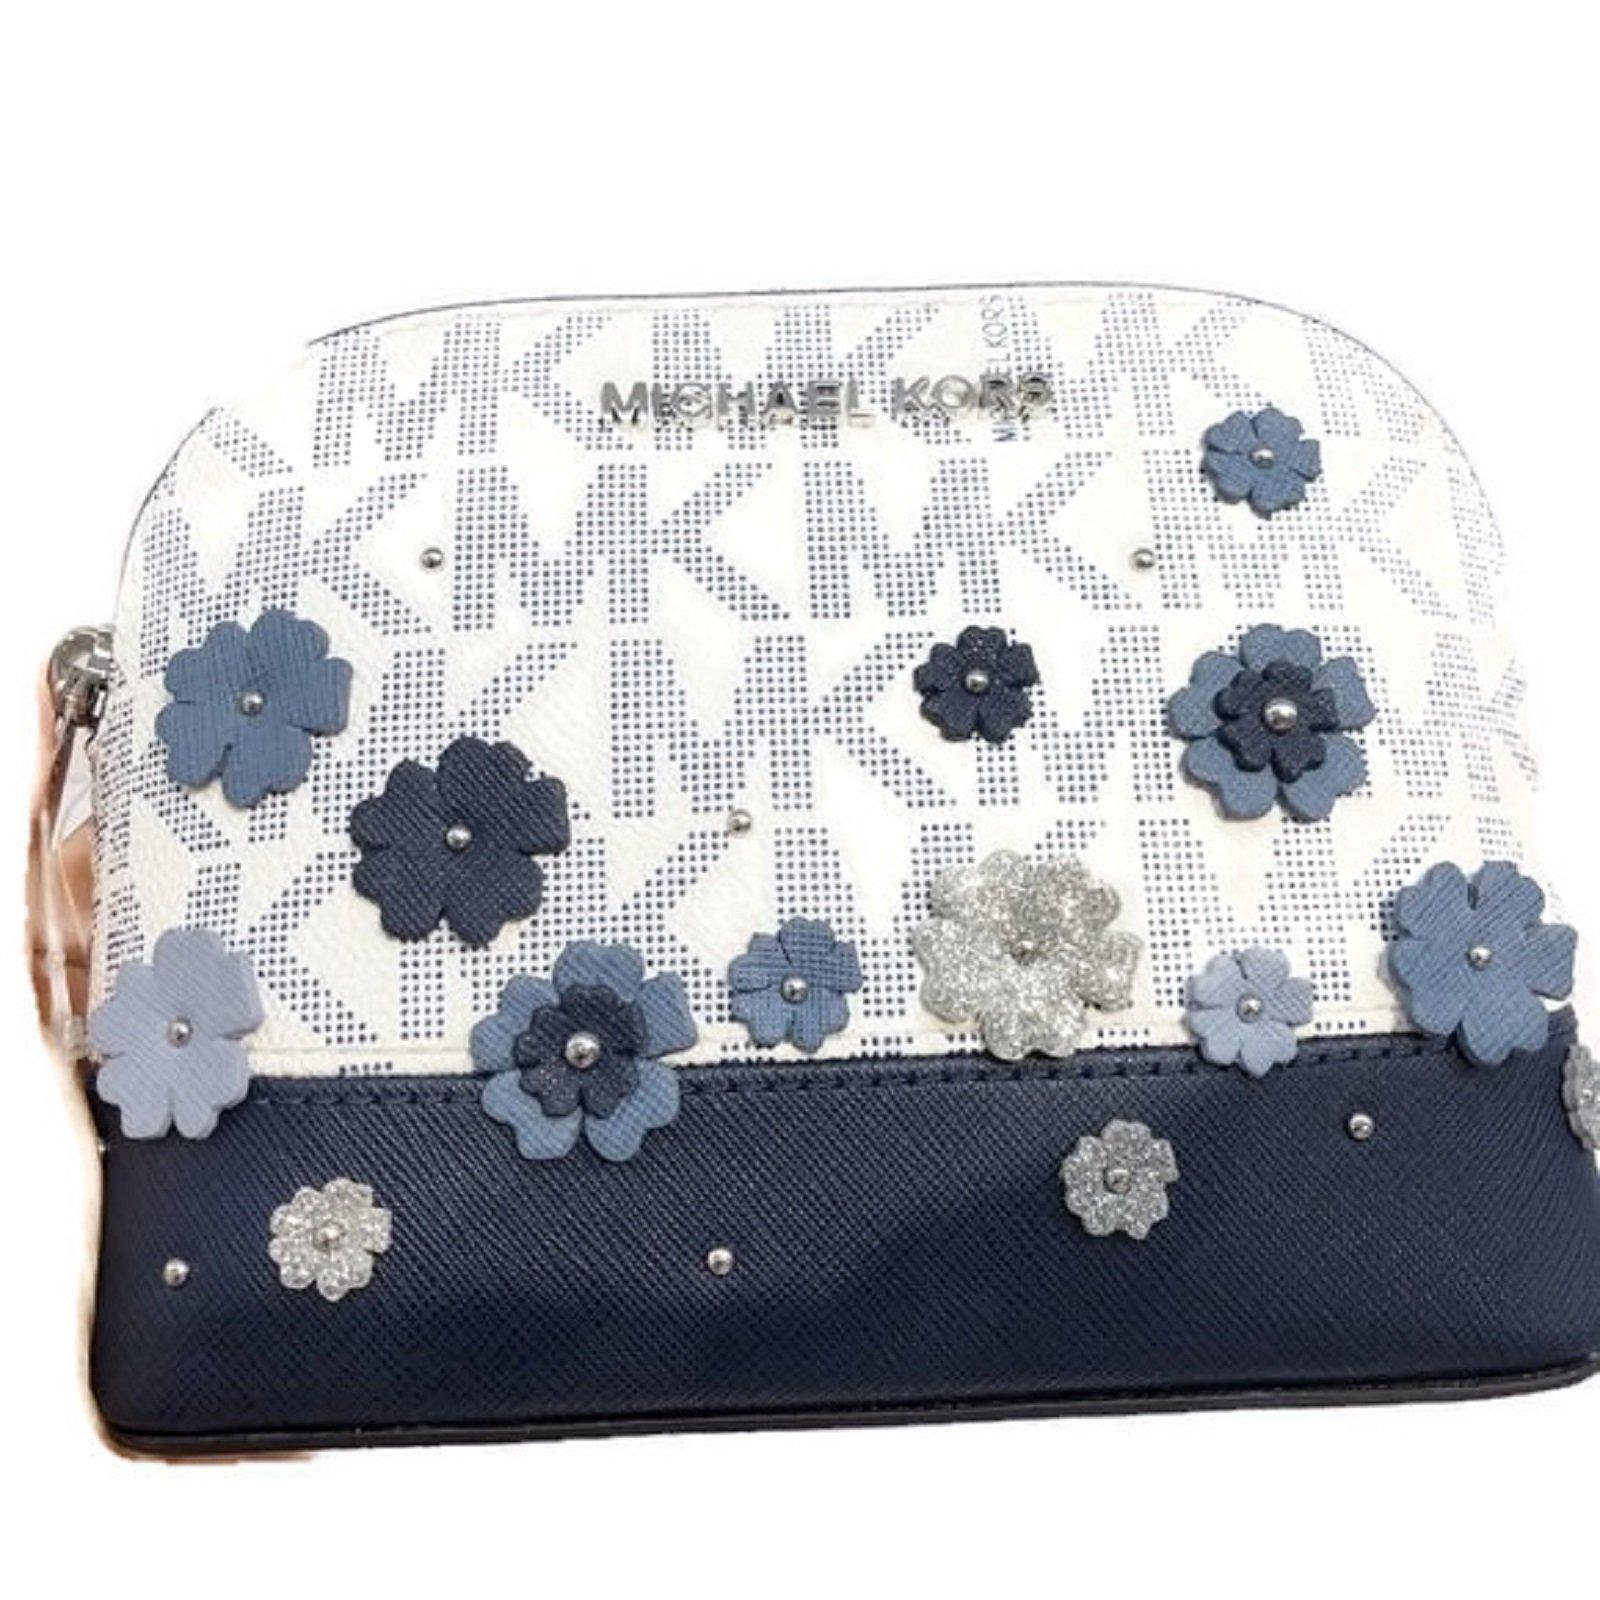 MICHAEL Michael Kors Women's EMMY Travel Pouch Make up Case Bag (Navy)